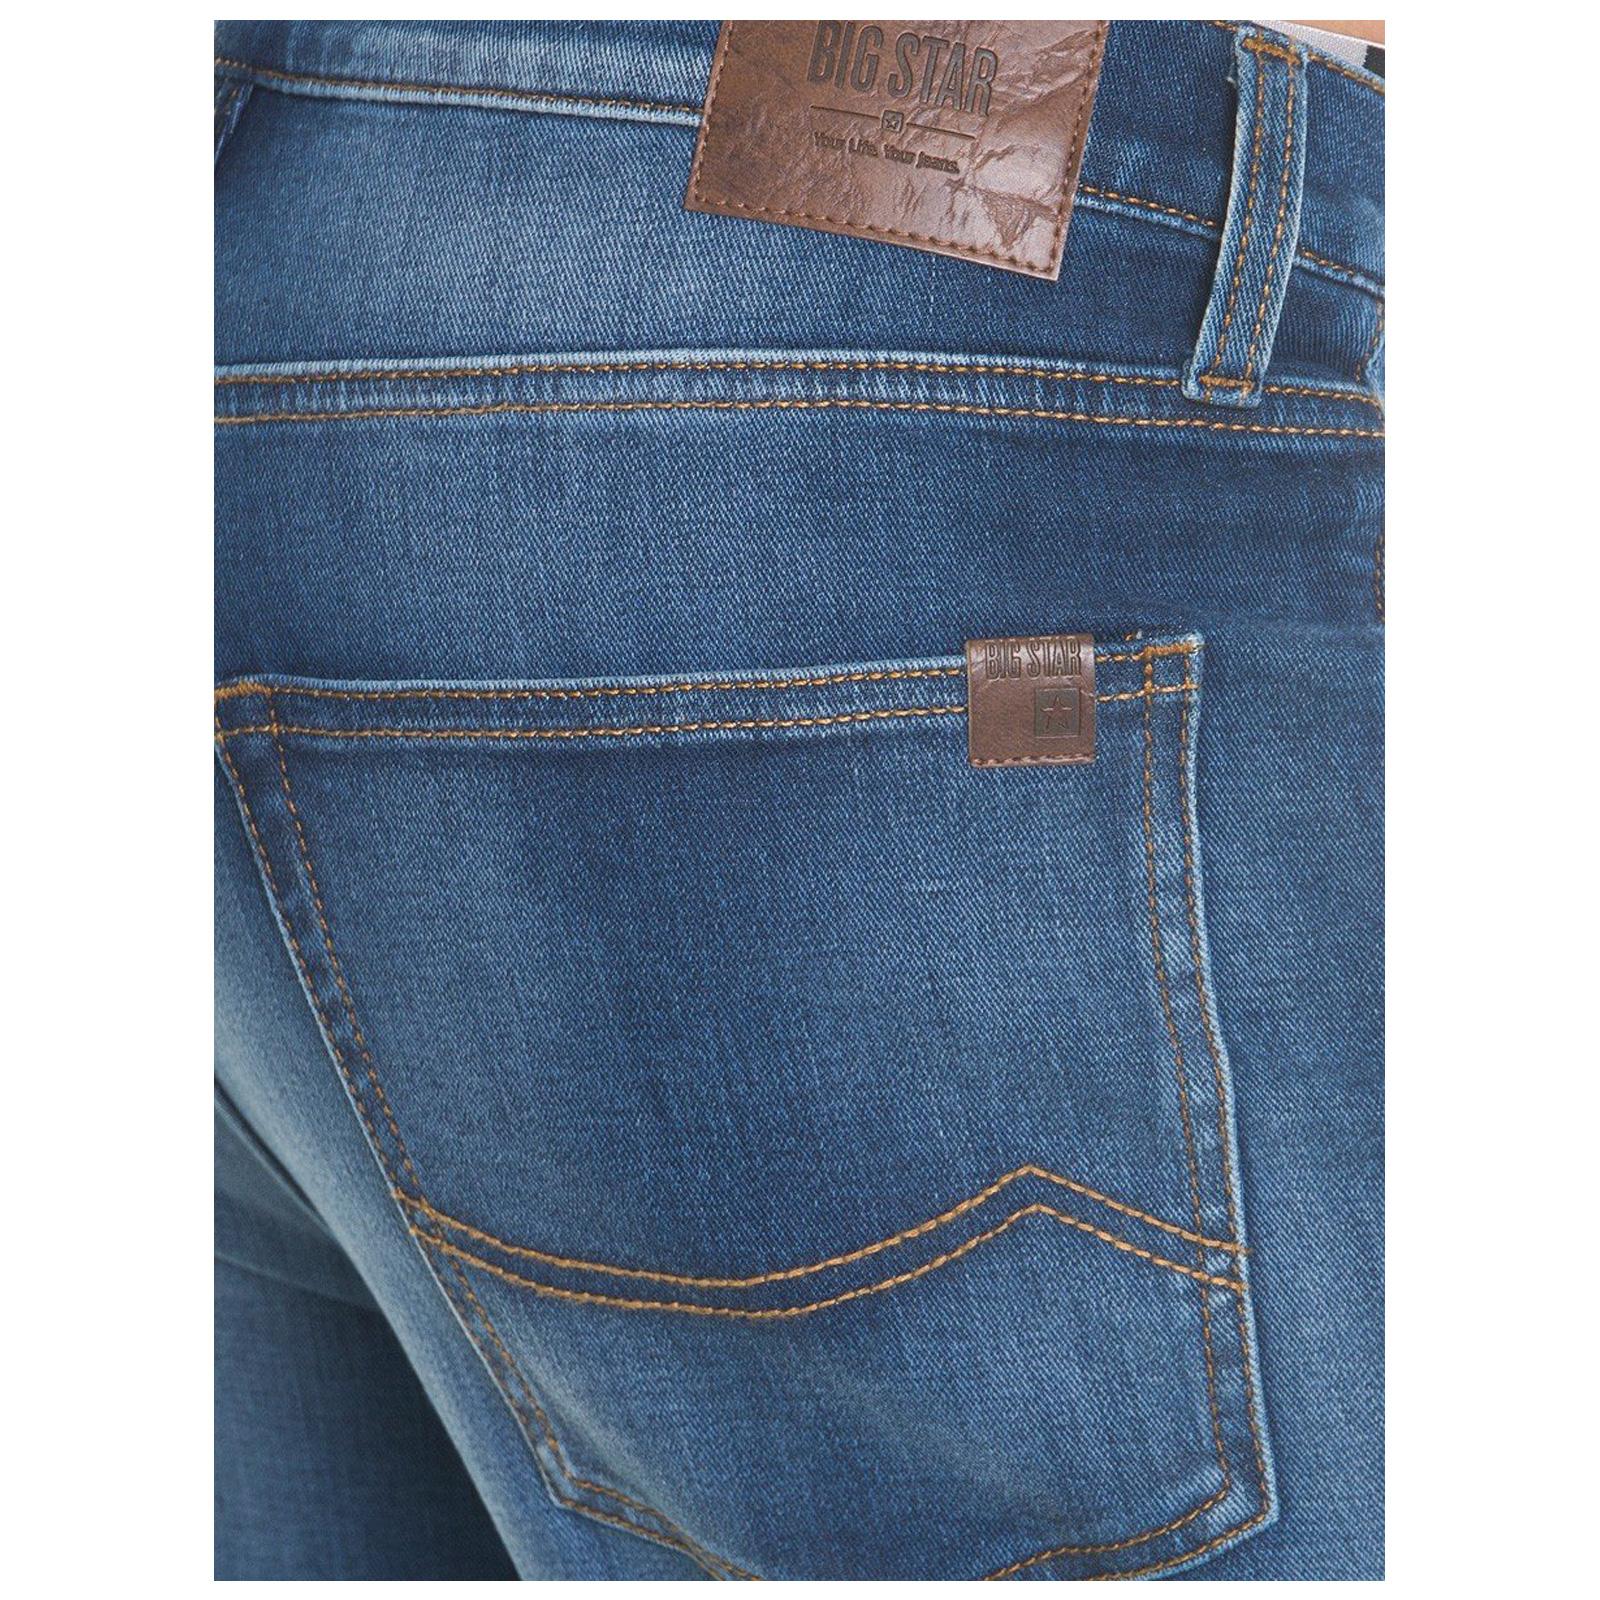 Big-Star-Mens-Denim-Jeans-Straight-Tapered-Leg-Style-Designer-Casual-Trousers thumbnail 9